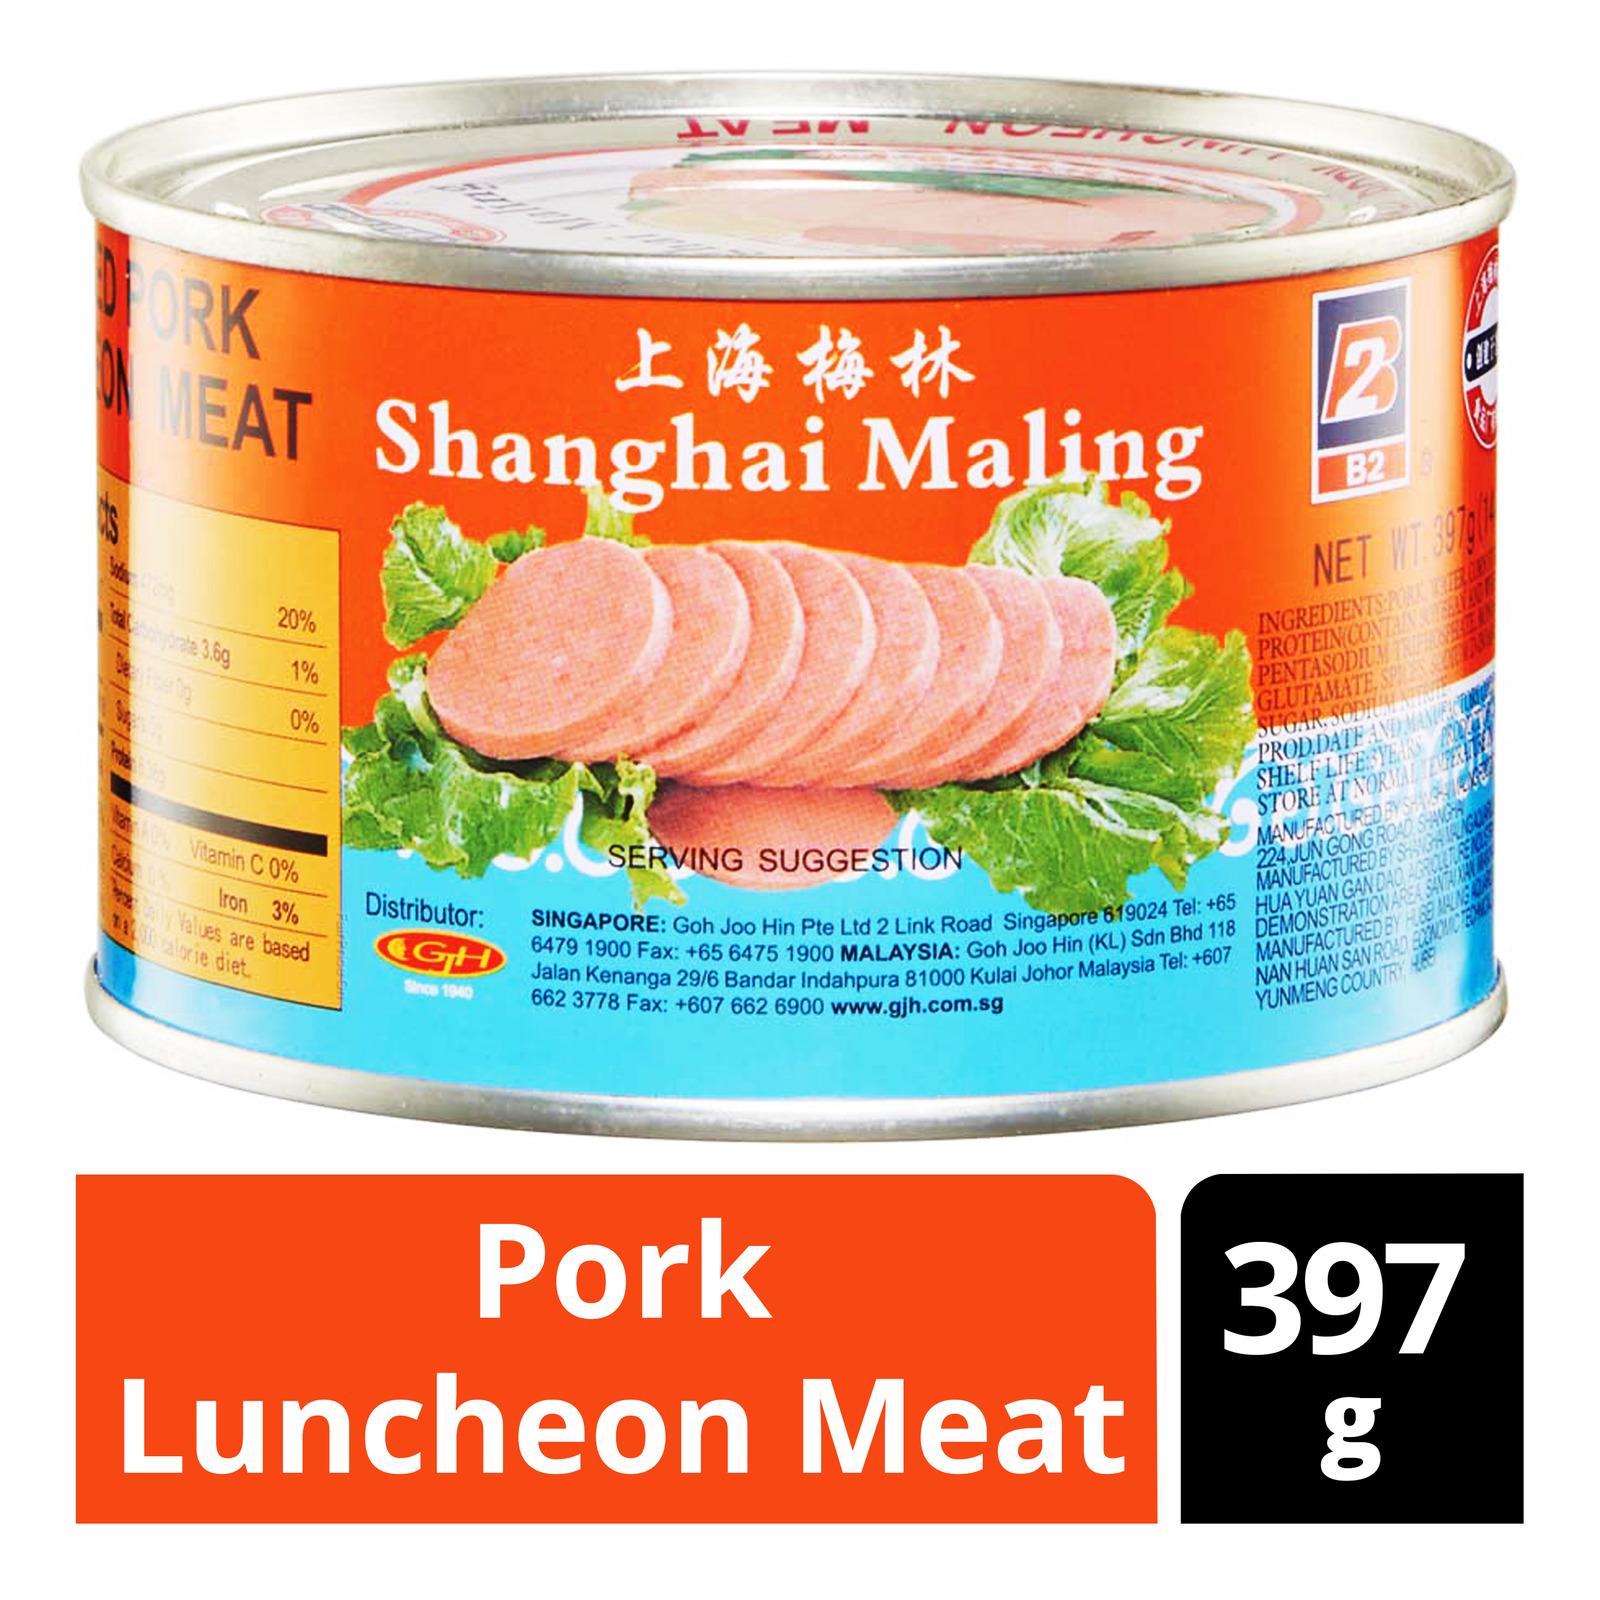 MALING Shanghai B2 Pork Luncheon Meat 397g